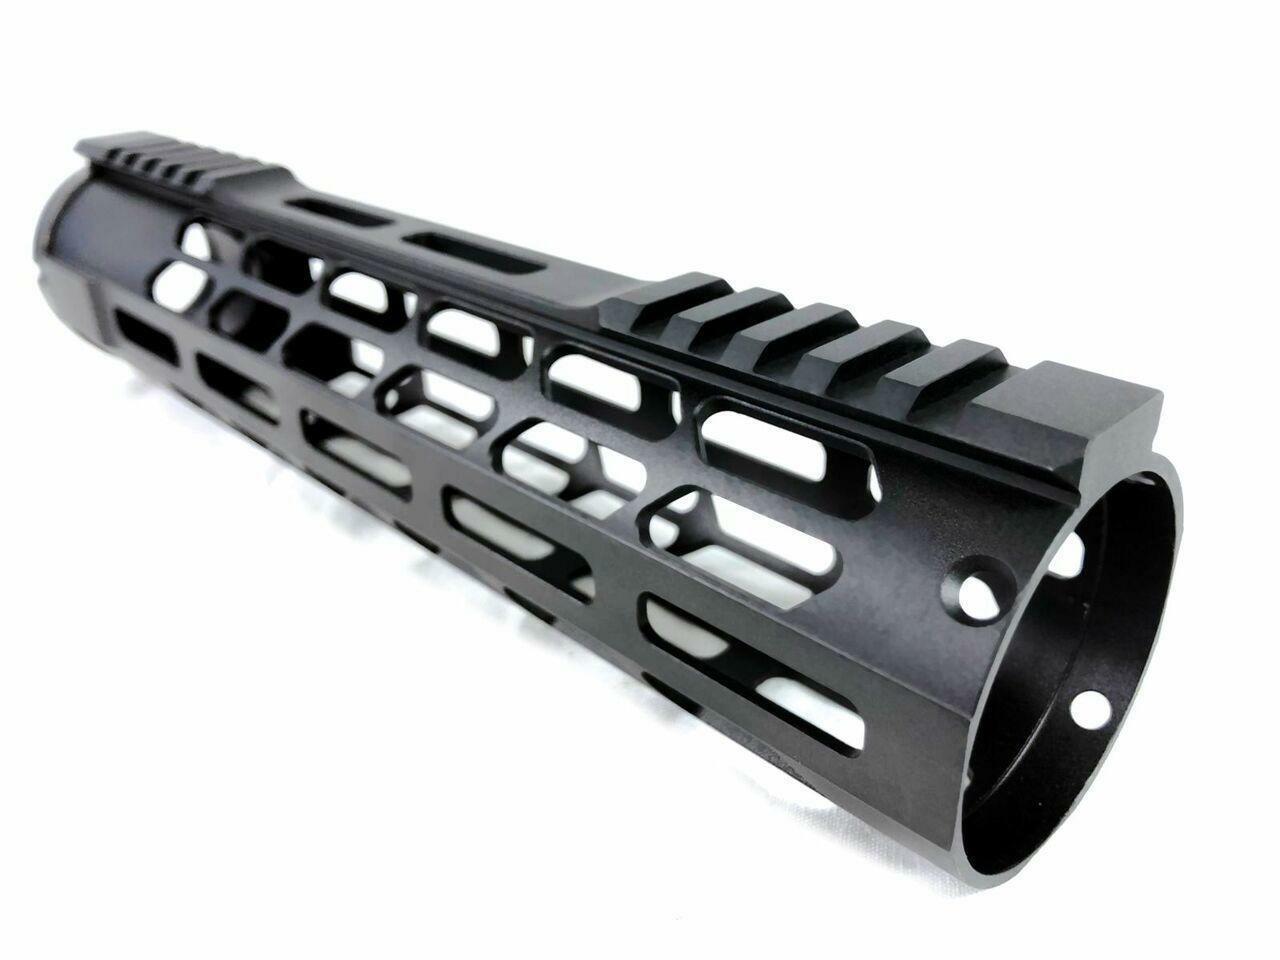 FIREHOG 12 Firehog MOD-SG4 AR-15 M-Lok Free Float Handguard